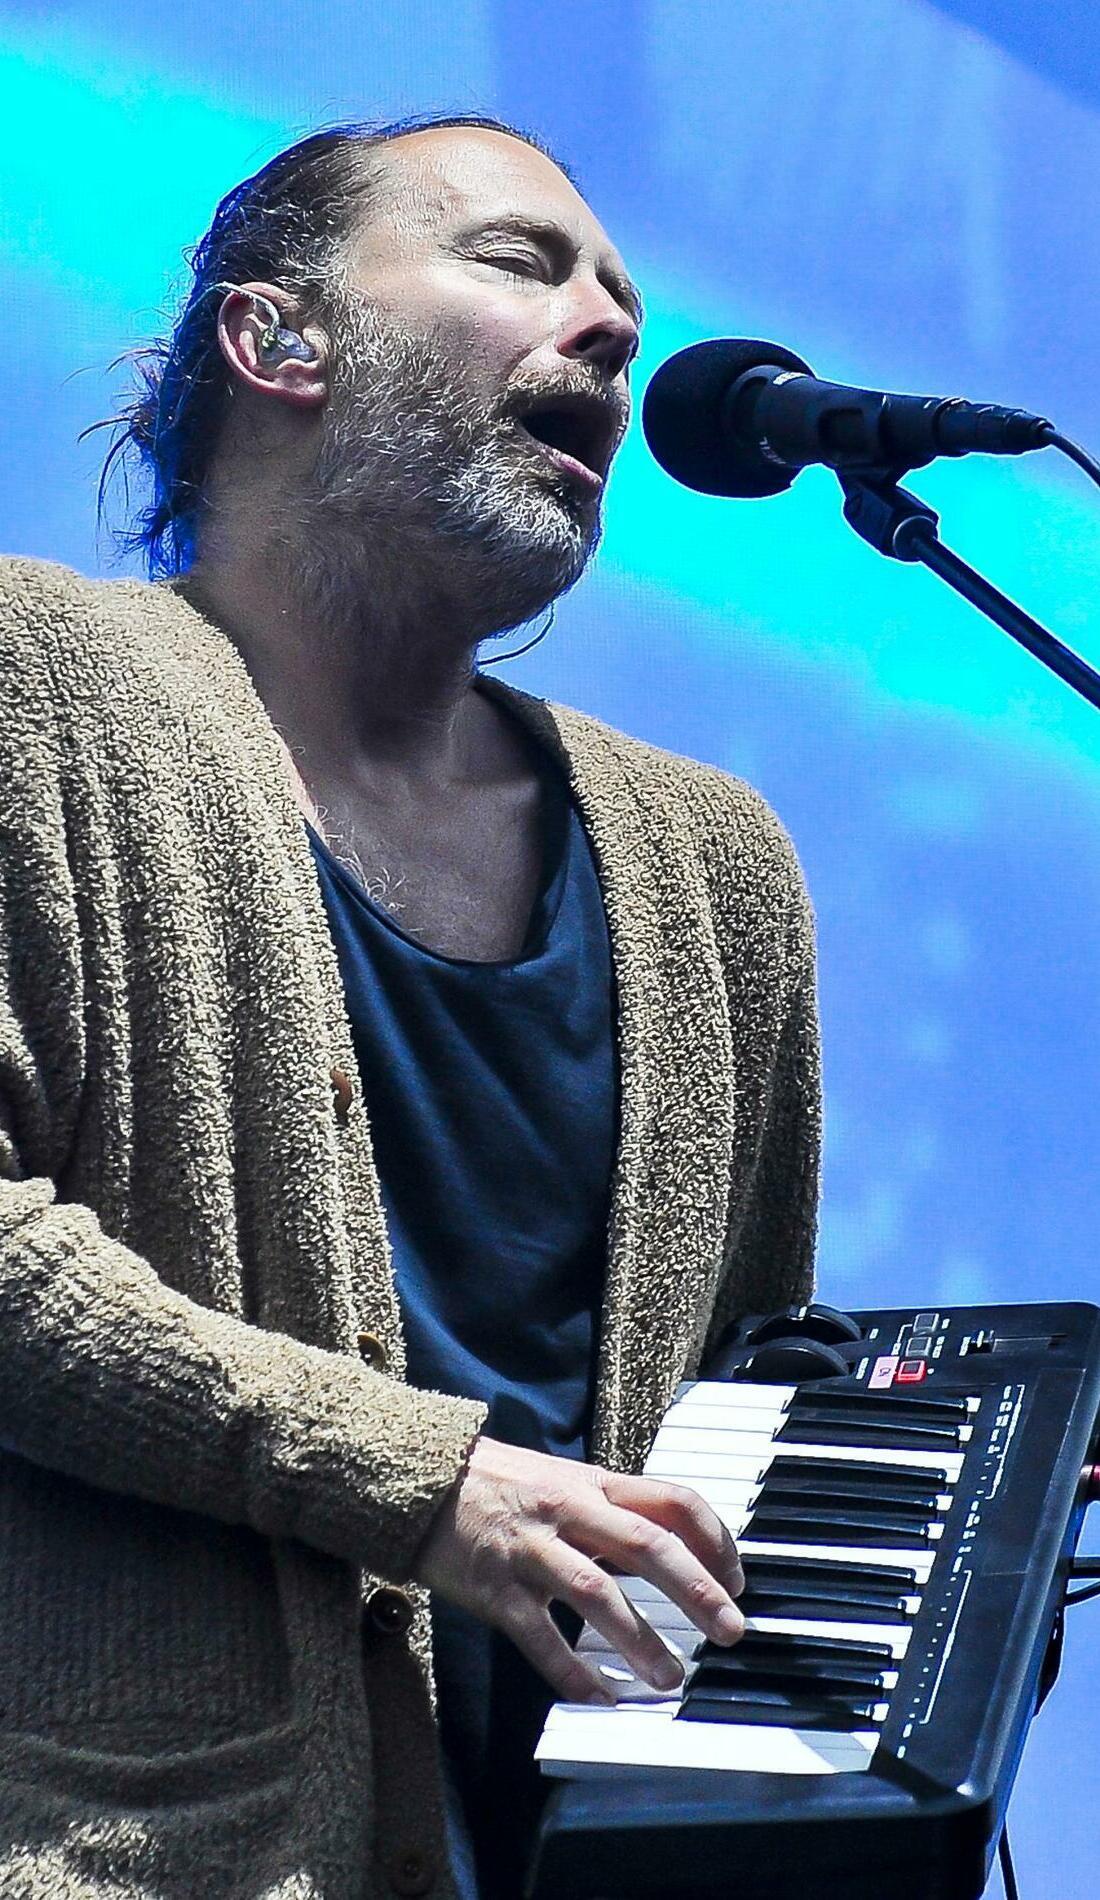 A Radiohead live event